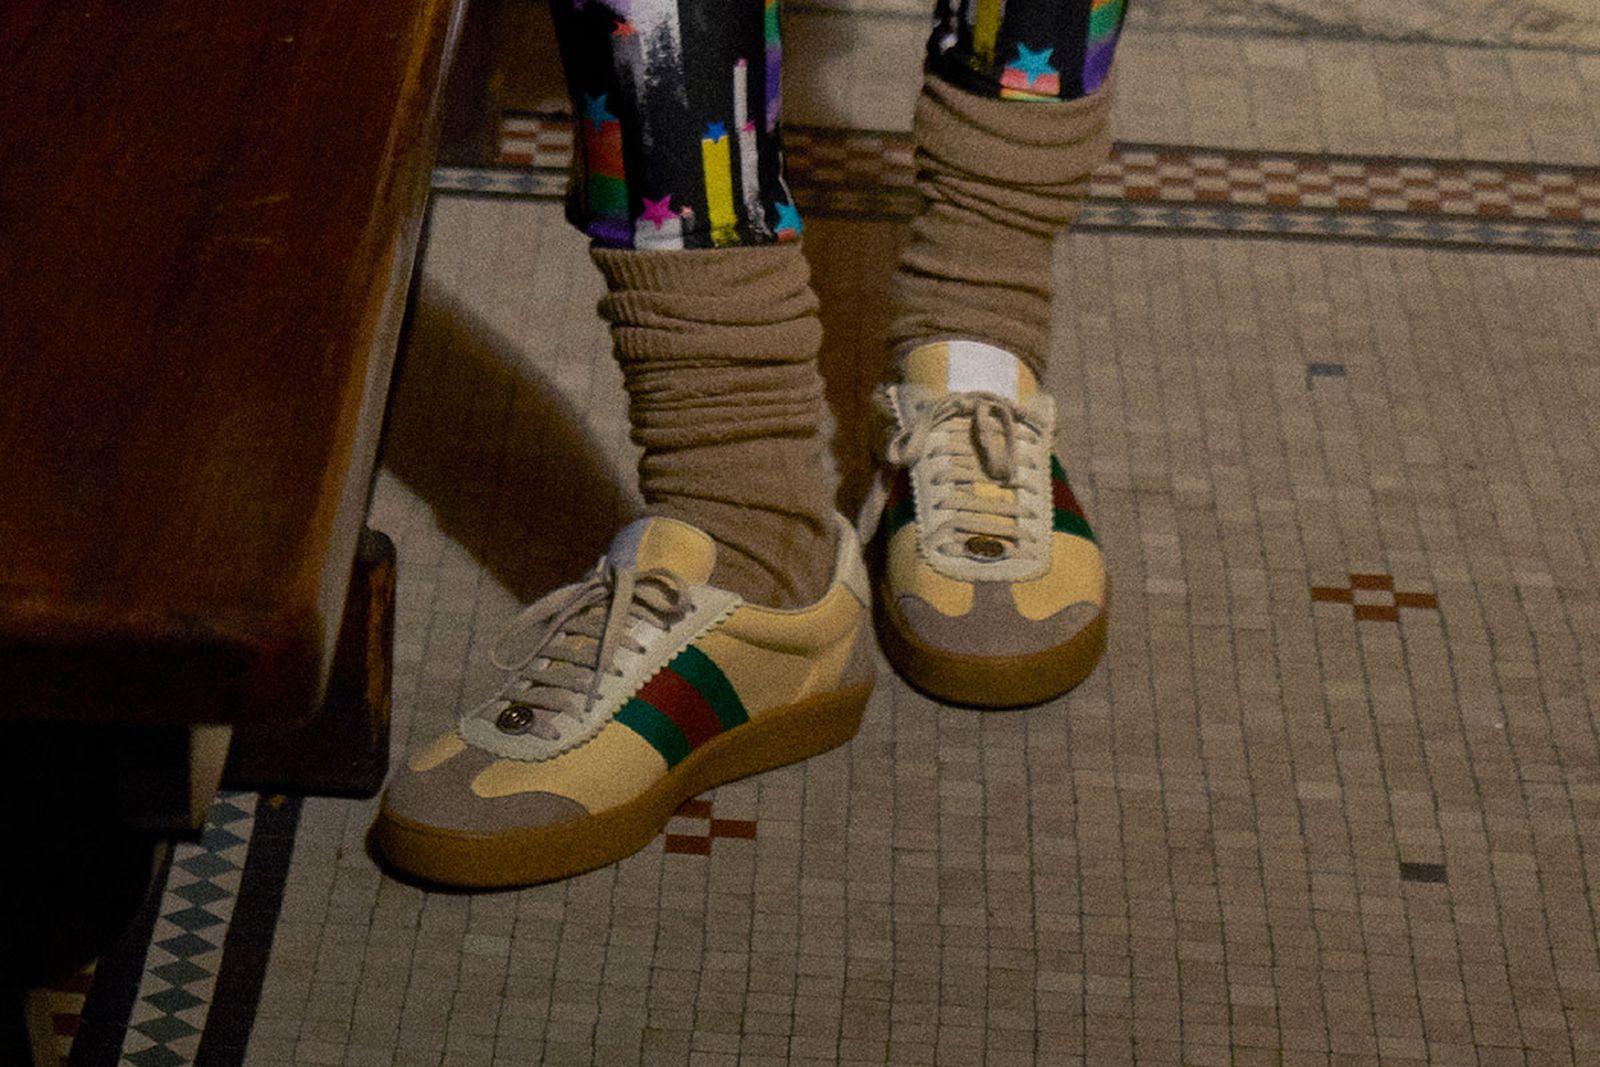 fw18 fashion week best sneakers gucci 2Chainz Maison Margiela Nike